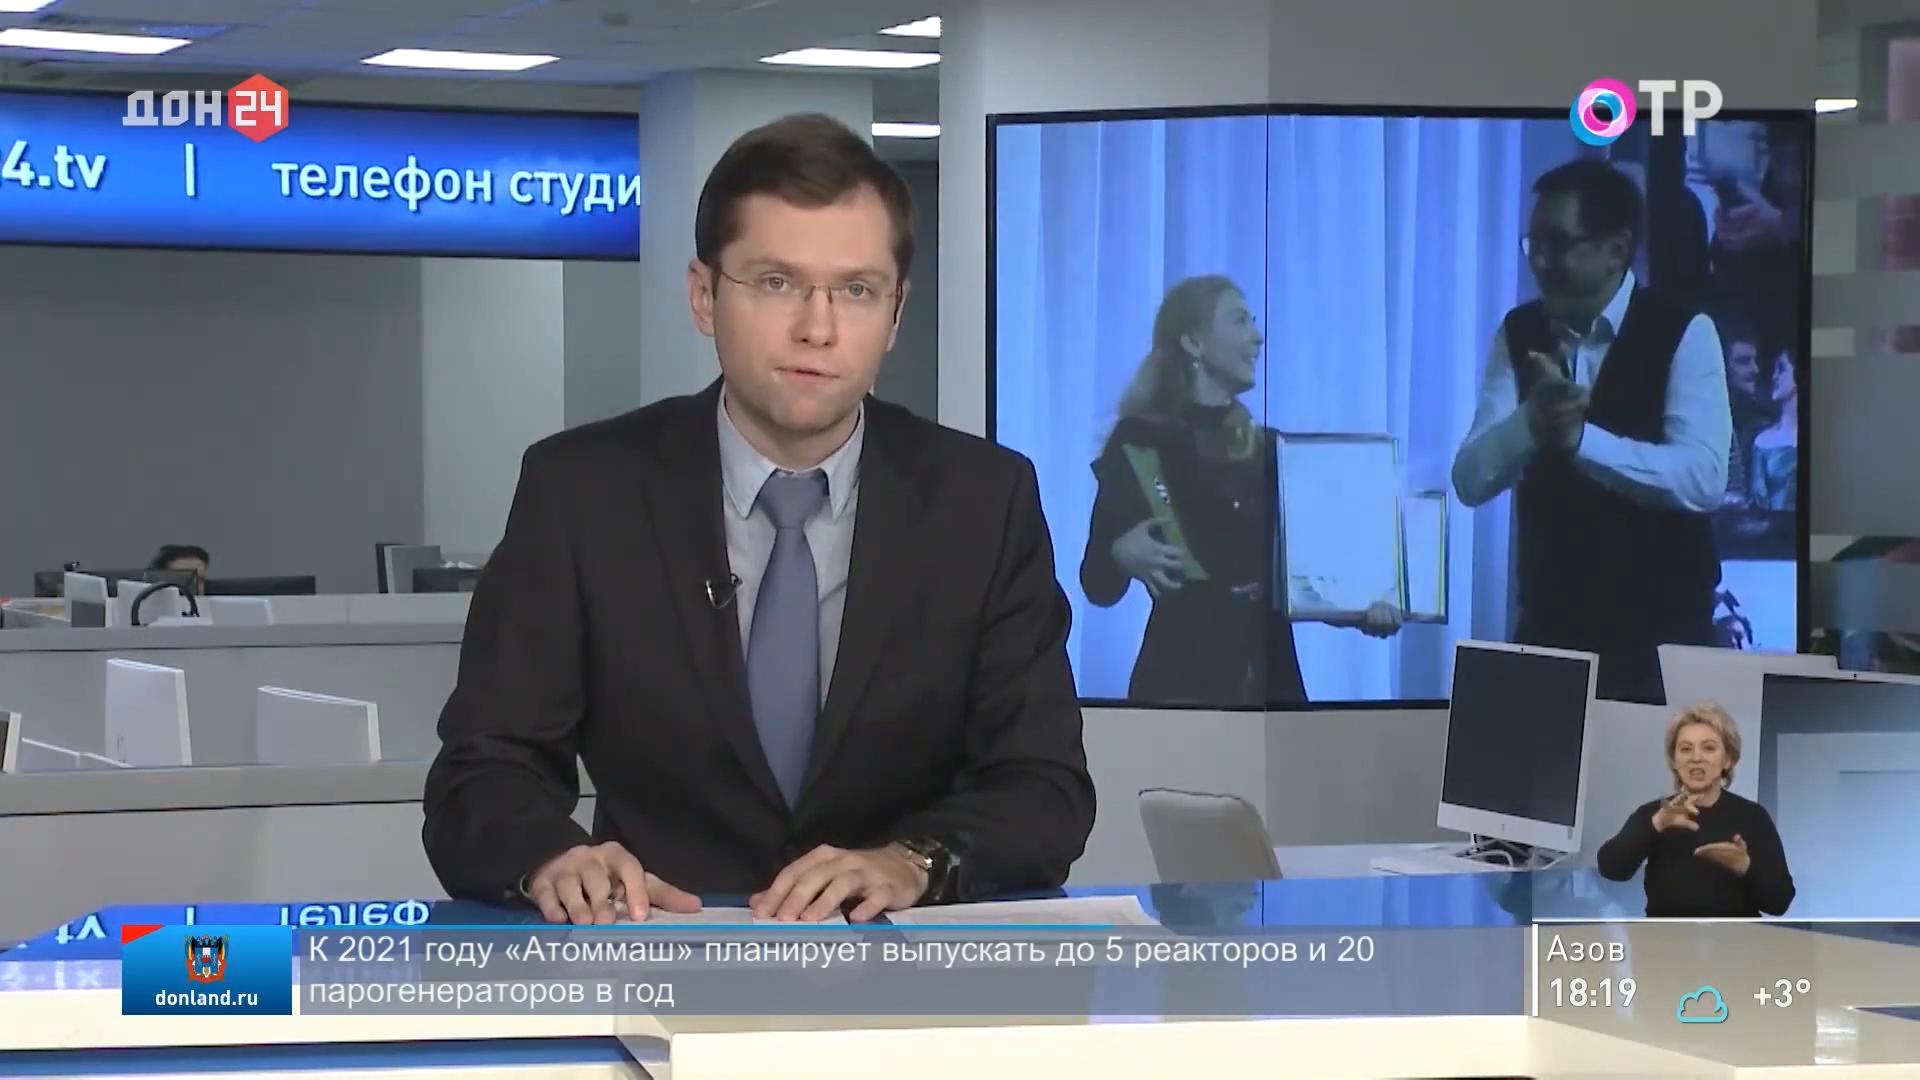 Новости ДОН-24